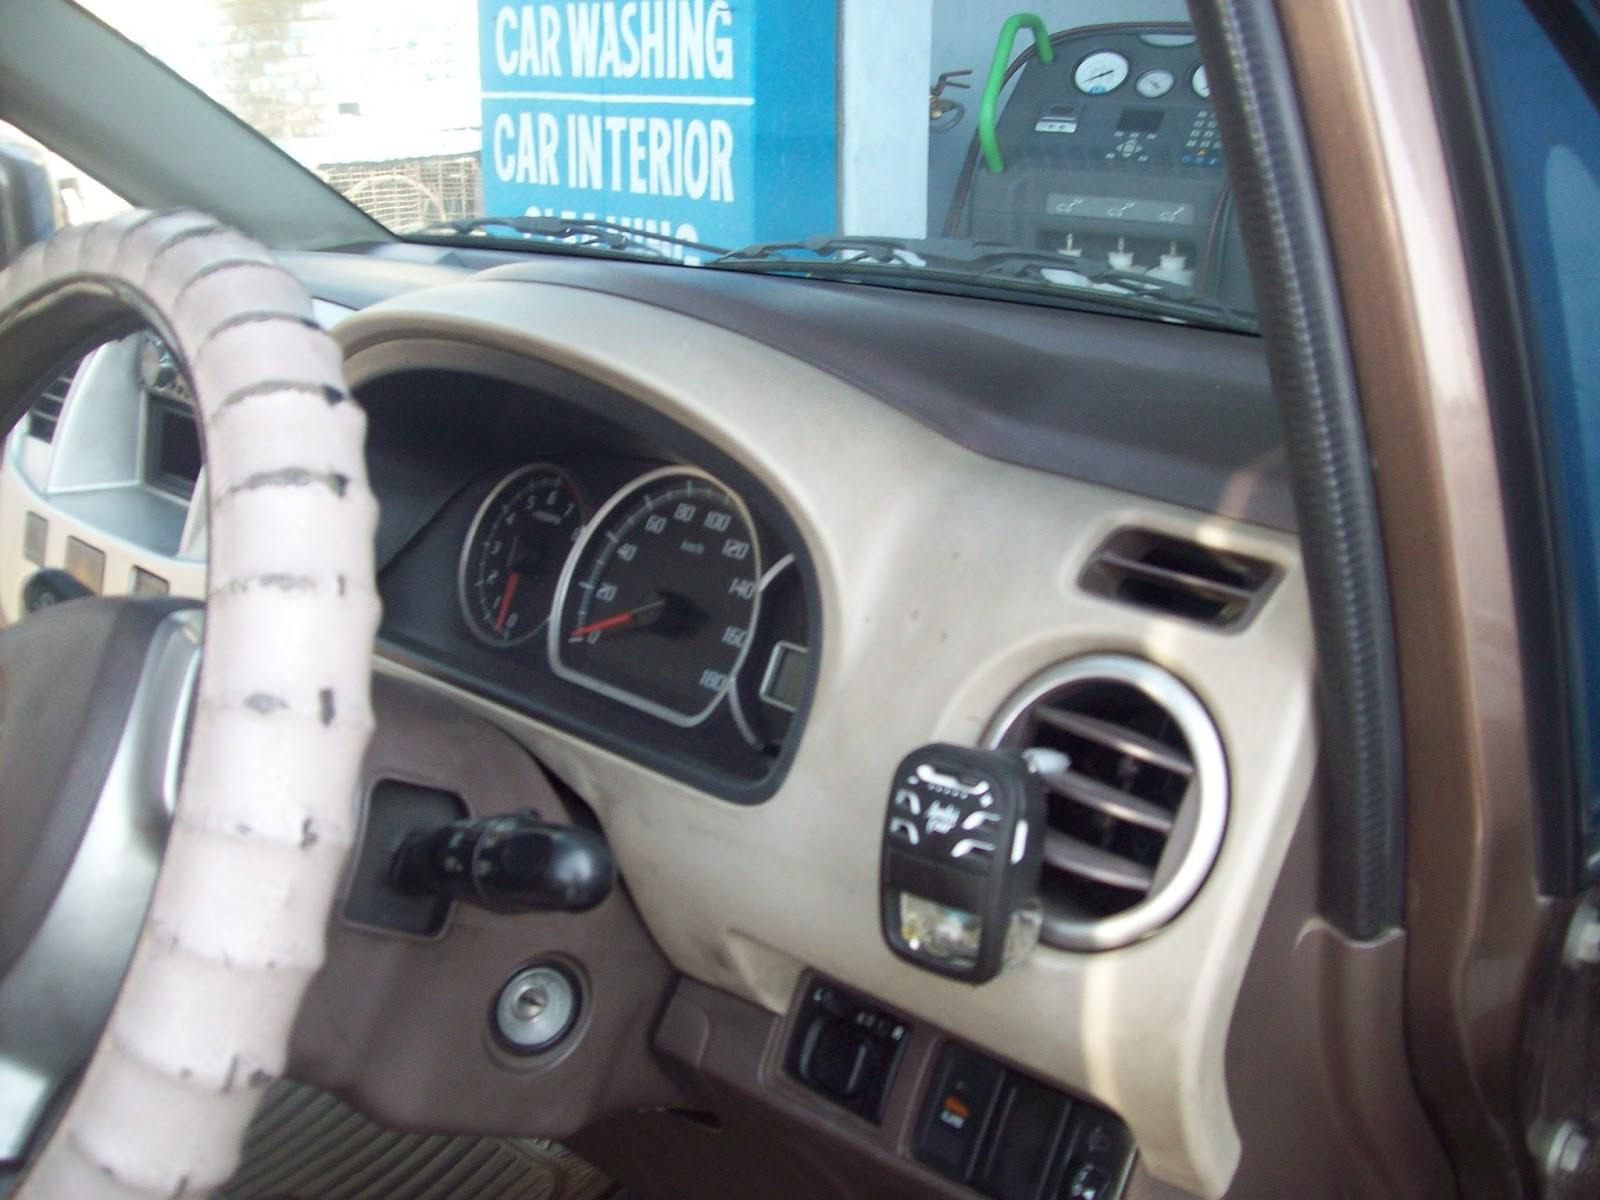 Megapower bosch car service jammu car interior cleaning - Vehicle interior cleaning service ...